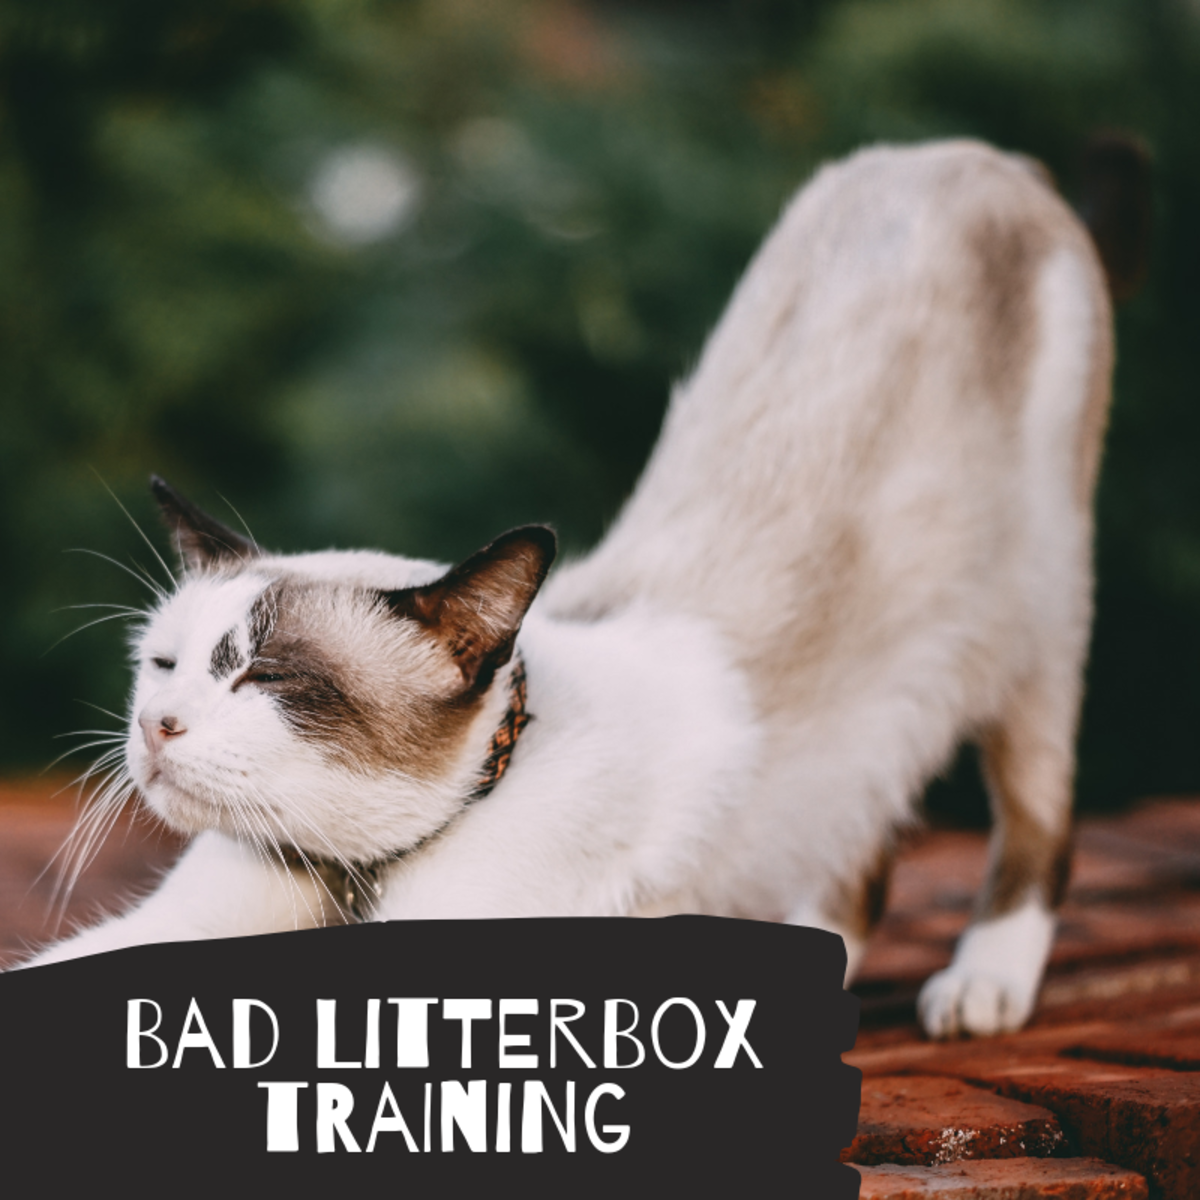 Bad Litter Box Training